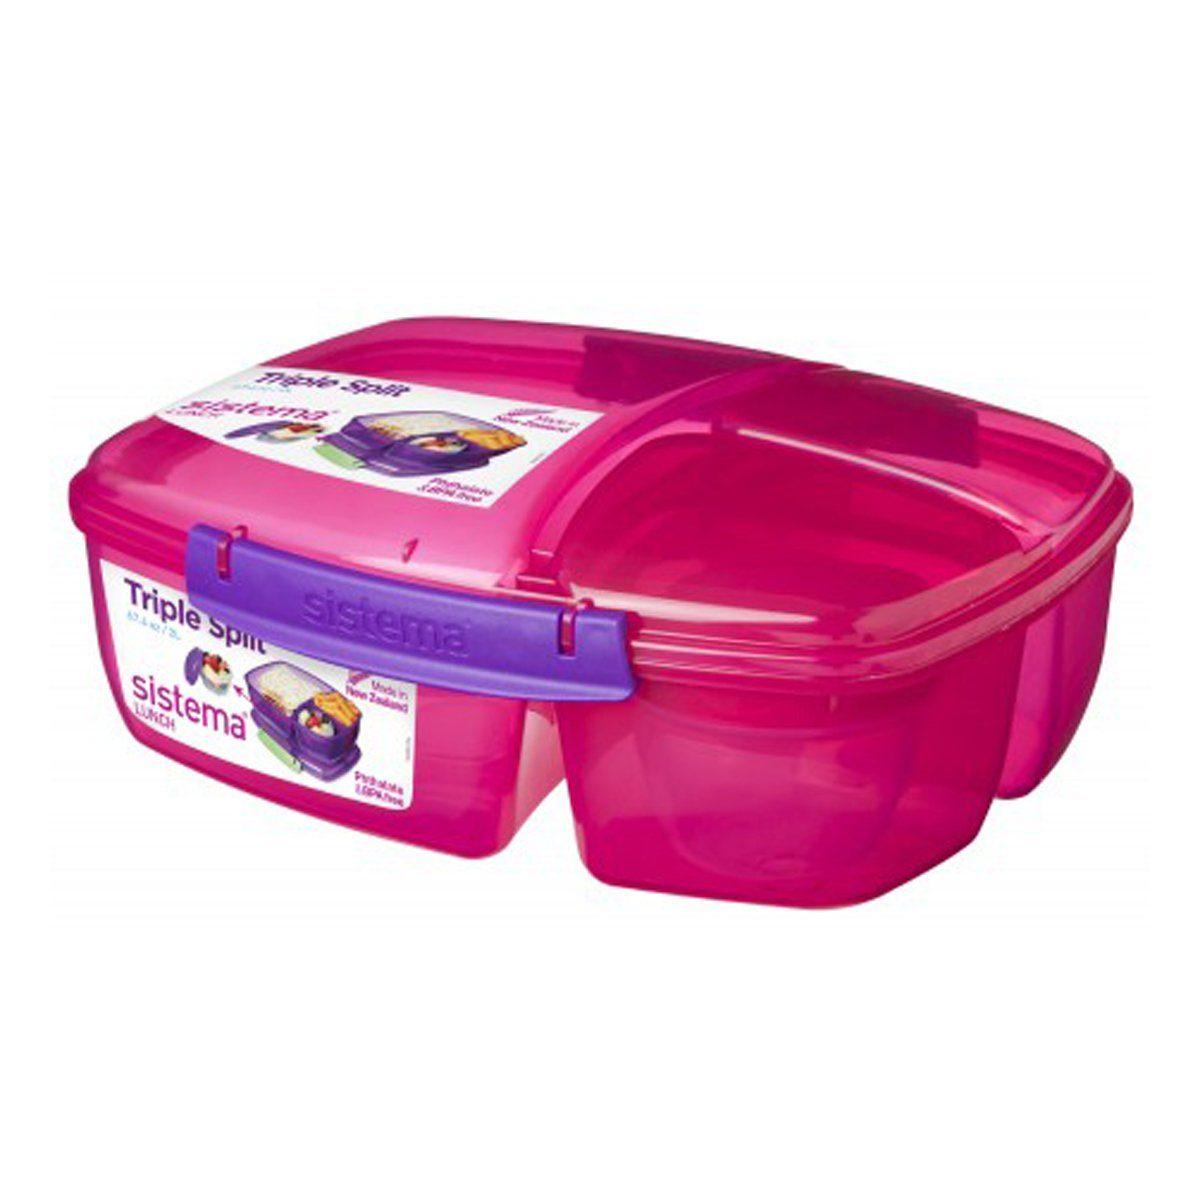 sistema Große Lunchbox Triple Split mit Joghurt Behälter, pink